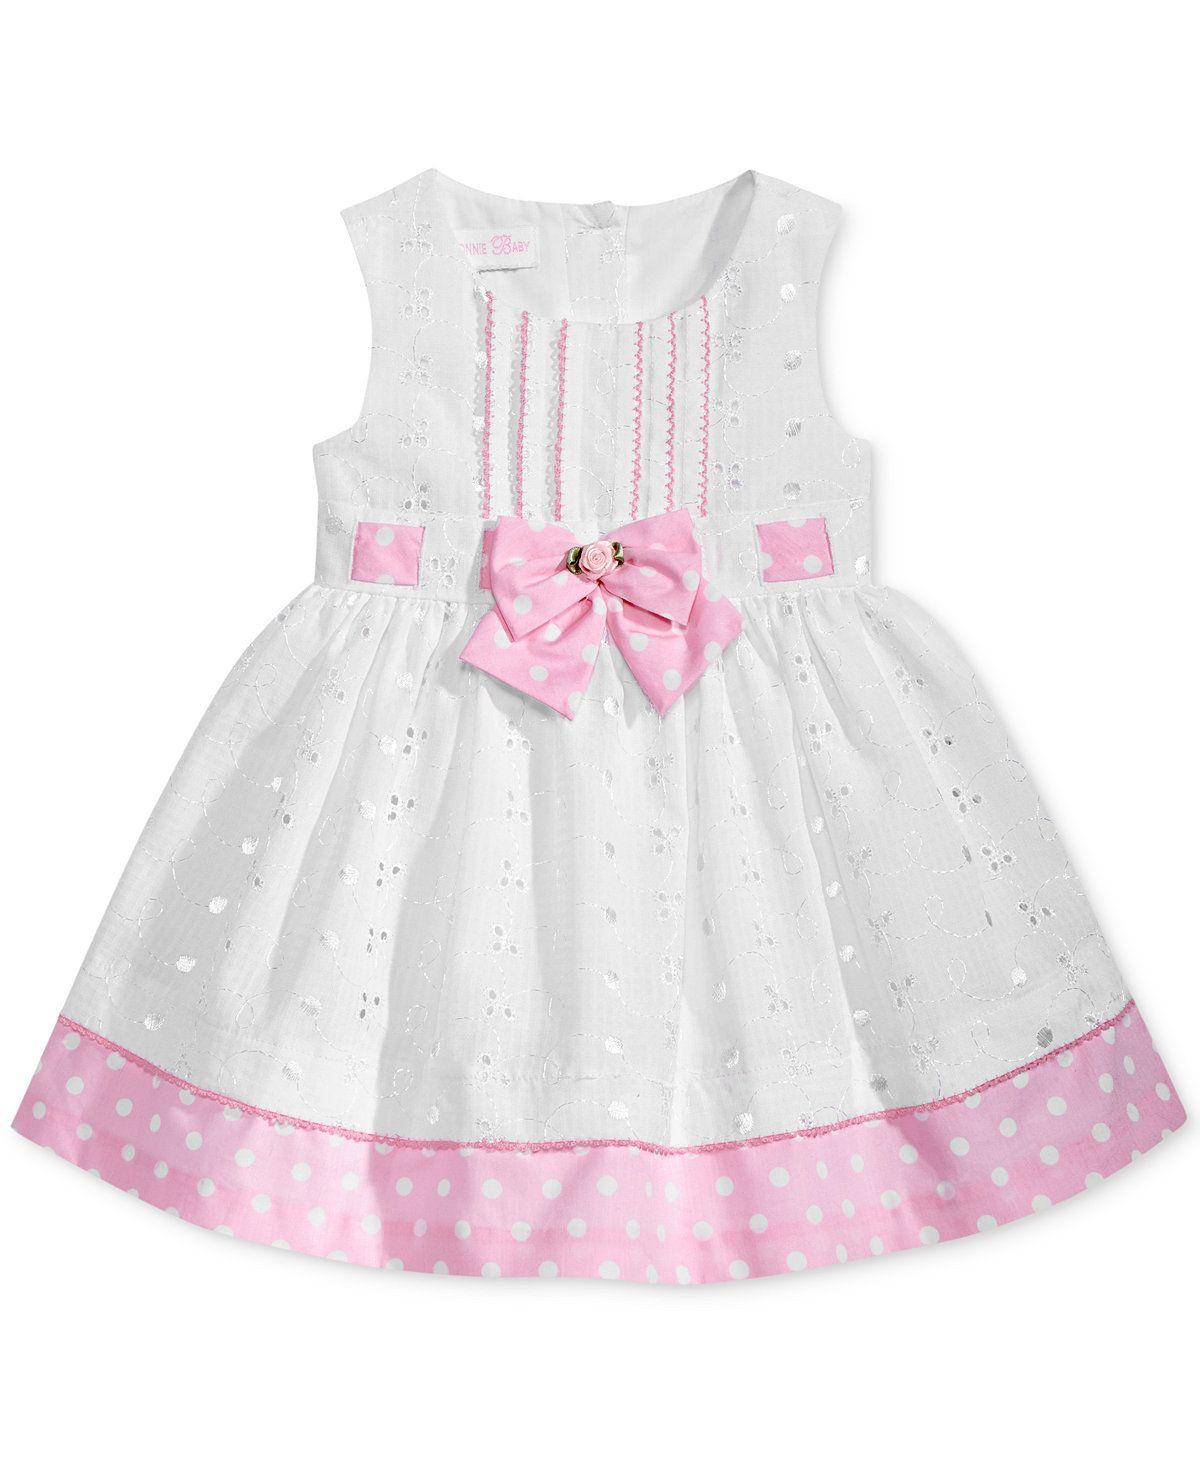 Bonnie baby dotprint eyelet dress baby girls months